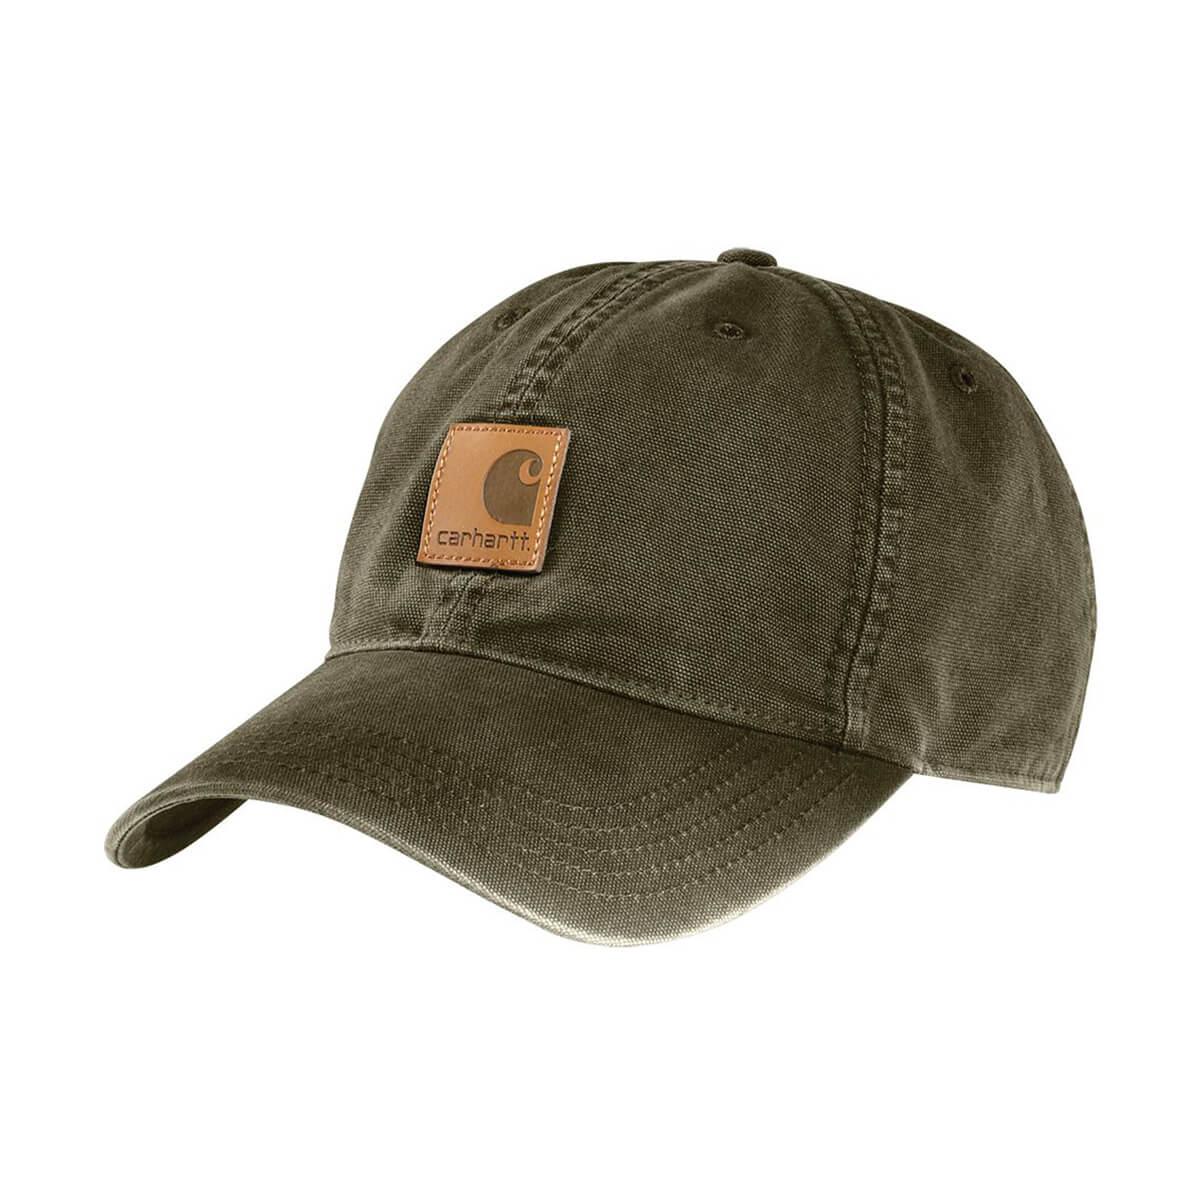 Canvas Cap - Army Green